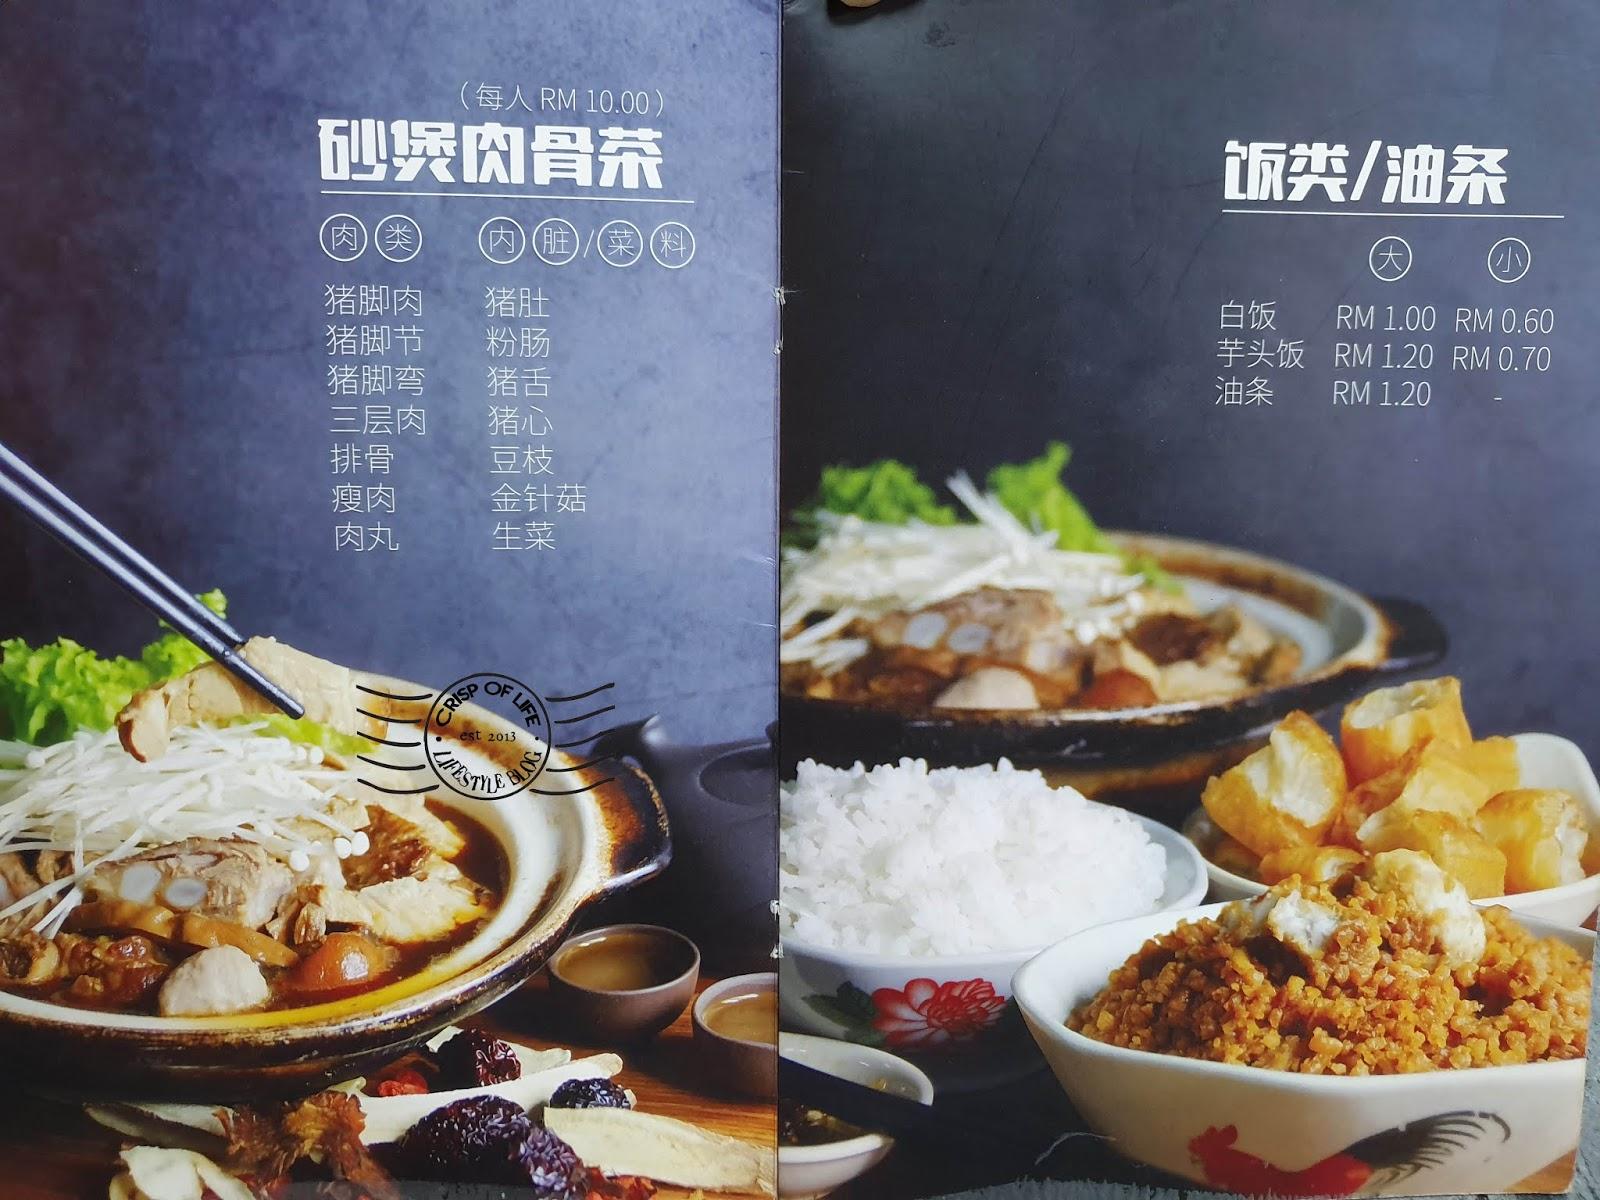 Lao Shan Dong Bak Kut Teh 老山东肉骨茶 @ Raja Uda, Butterworth Penang